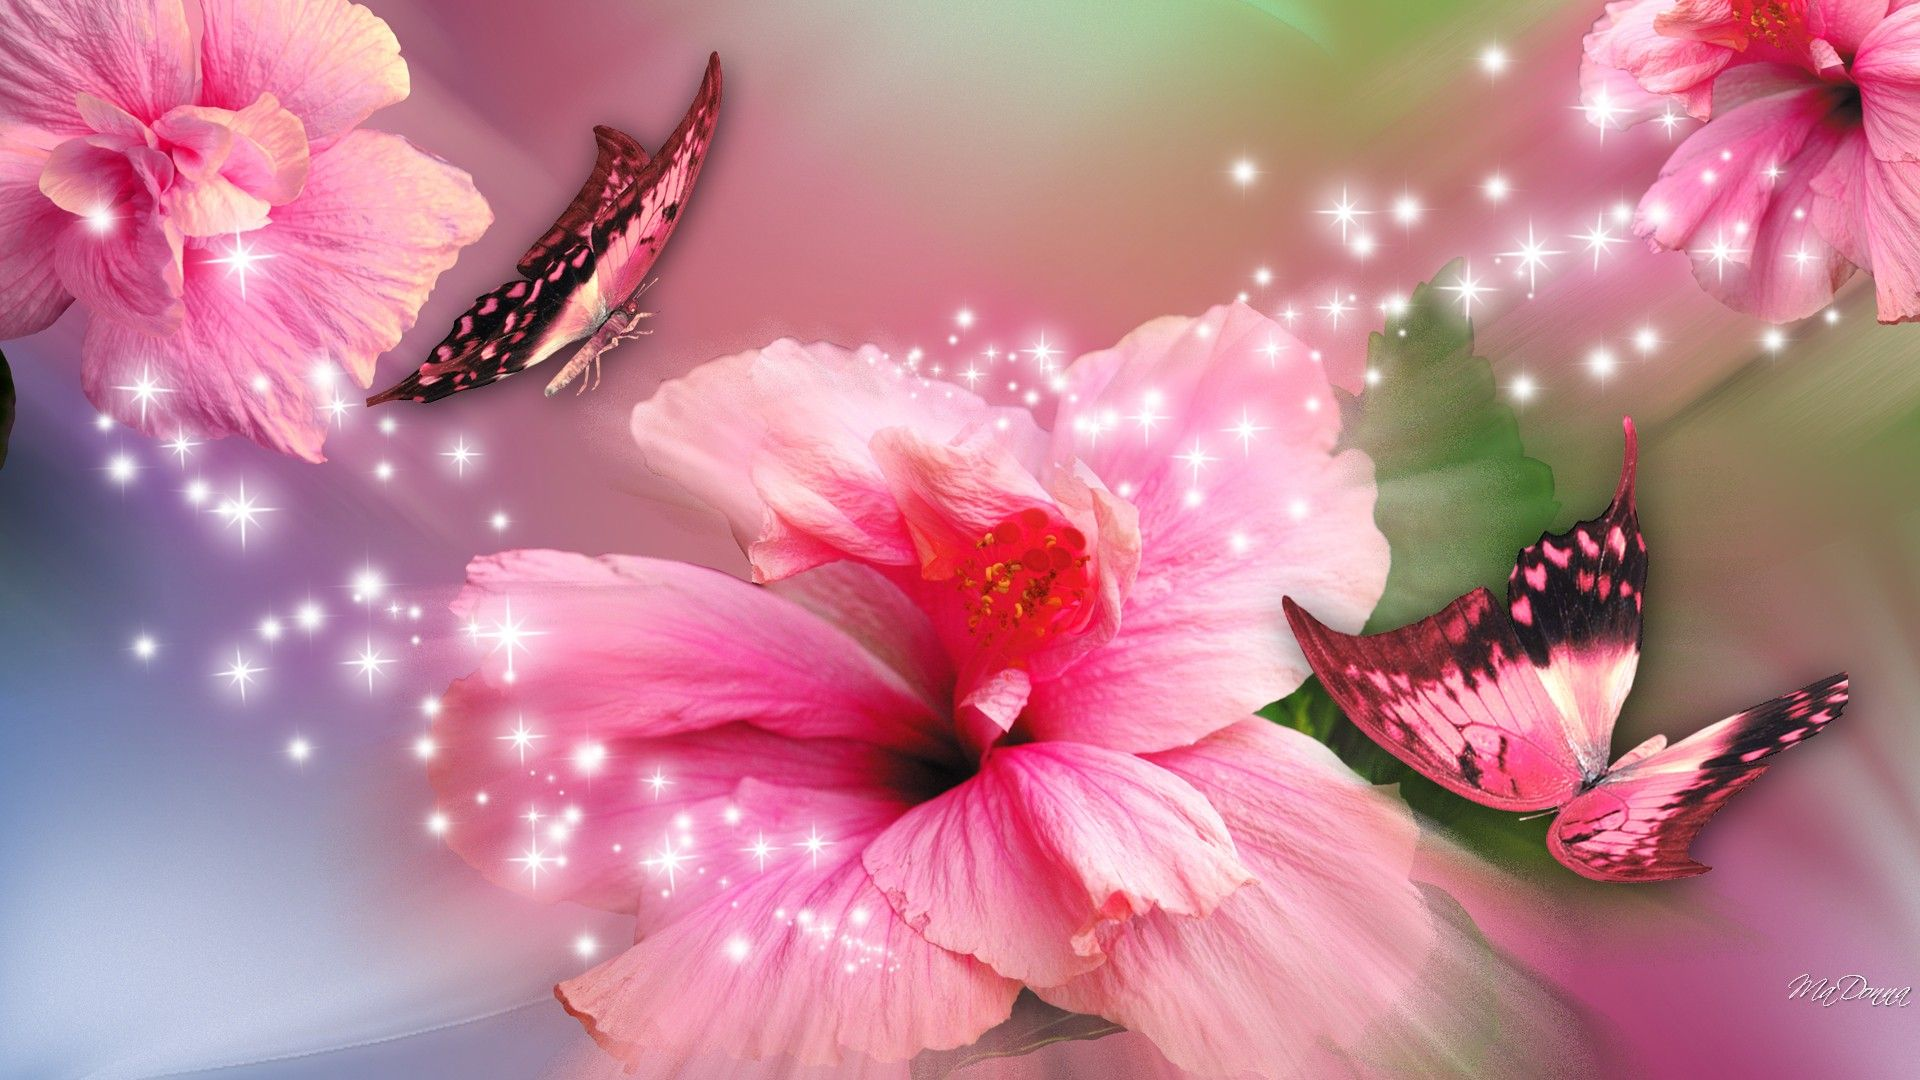 Flowers and Butterflies Pink Flowers Pinterest Flowers